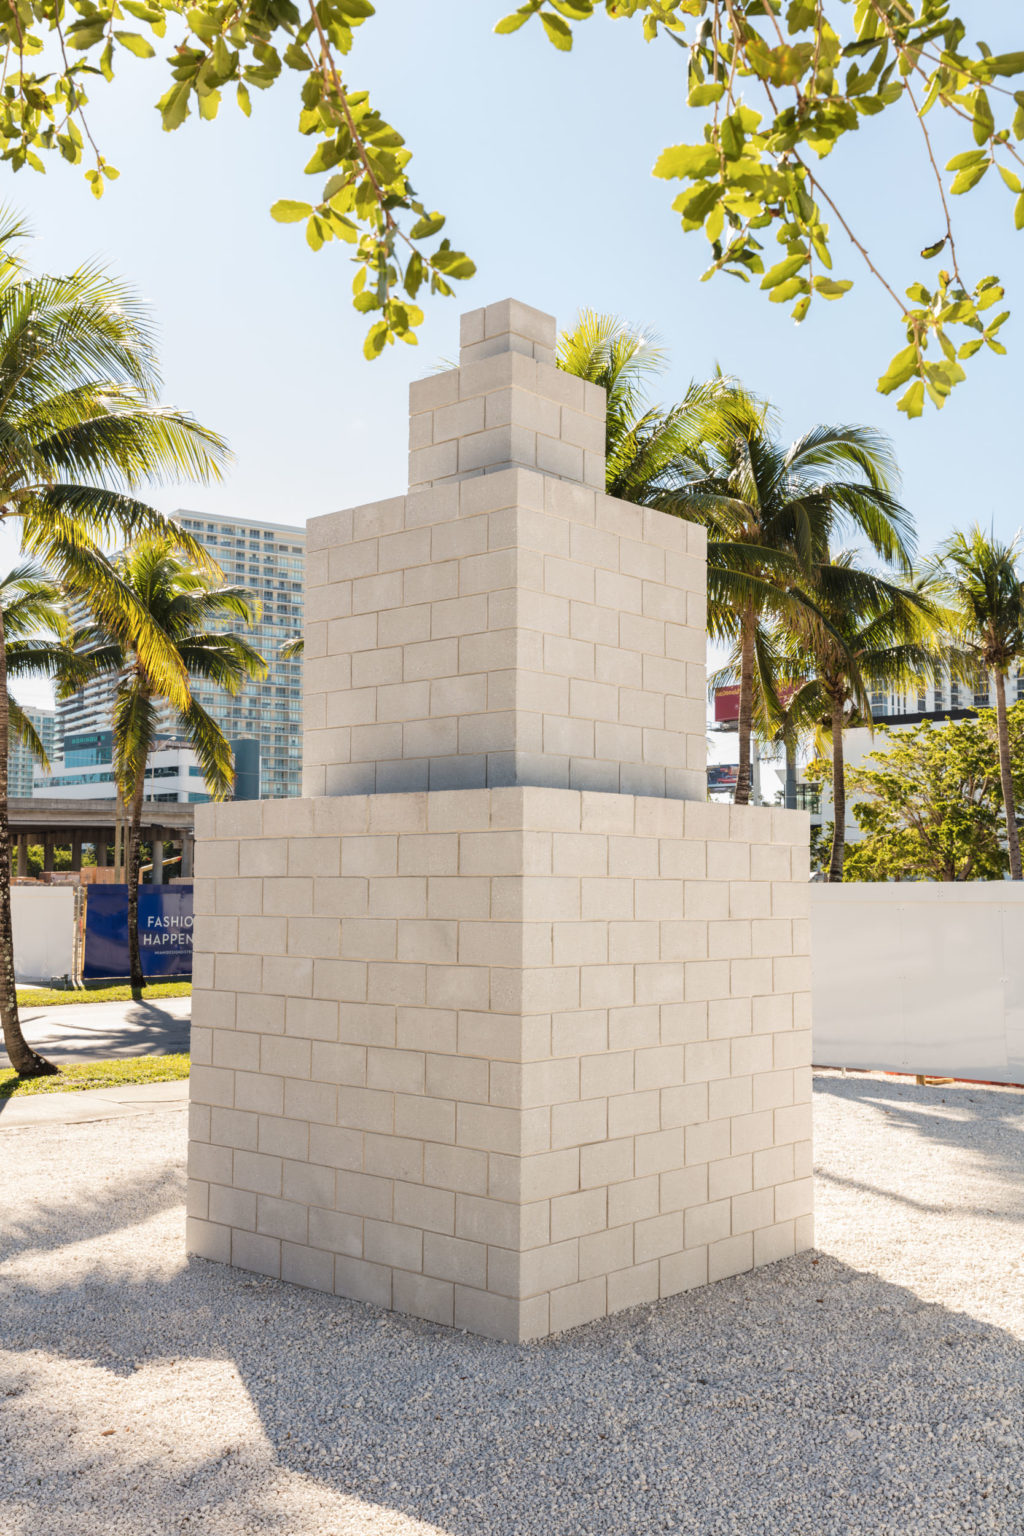 Installation view Sol LeWitt, Tower (Frankfurt), 1993 in the Miami Design District